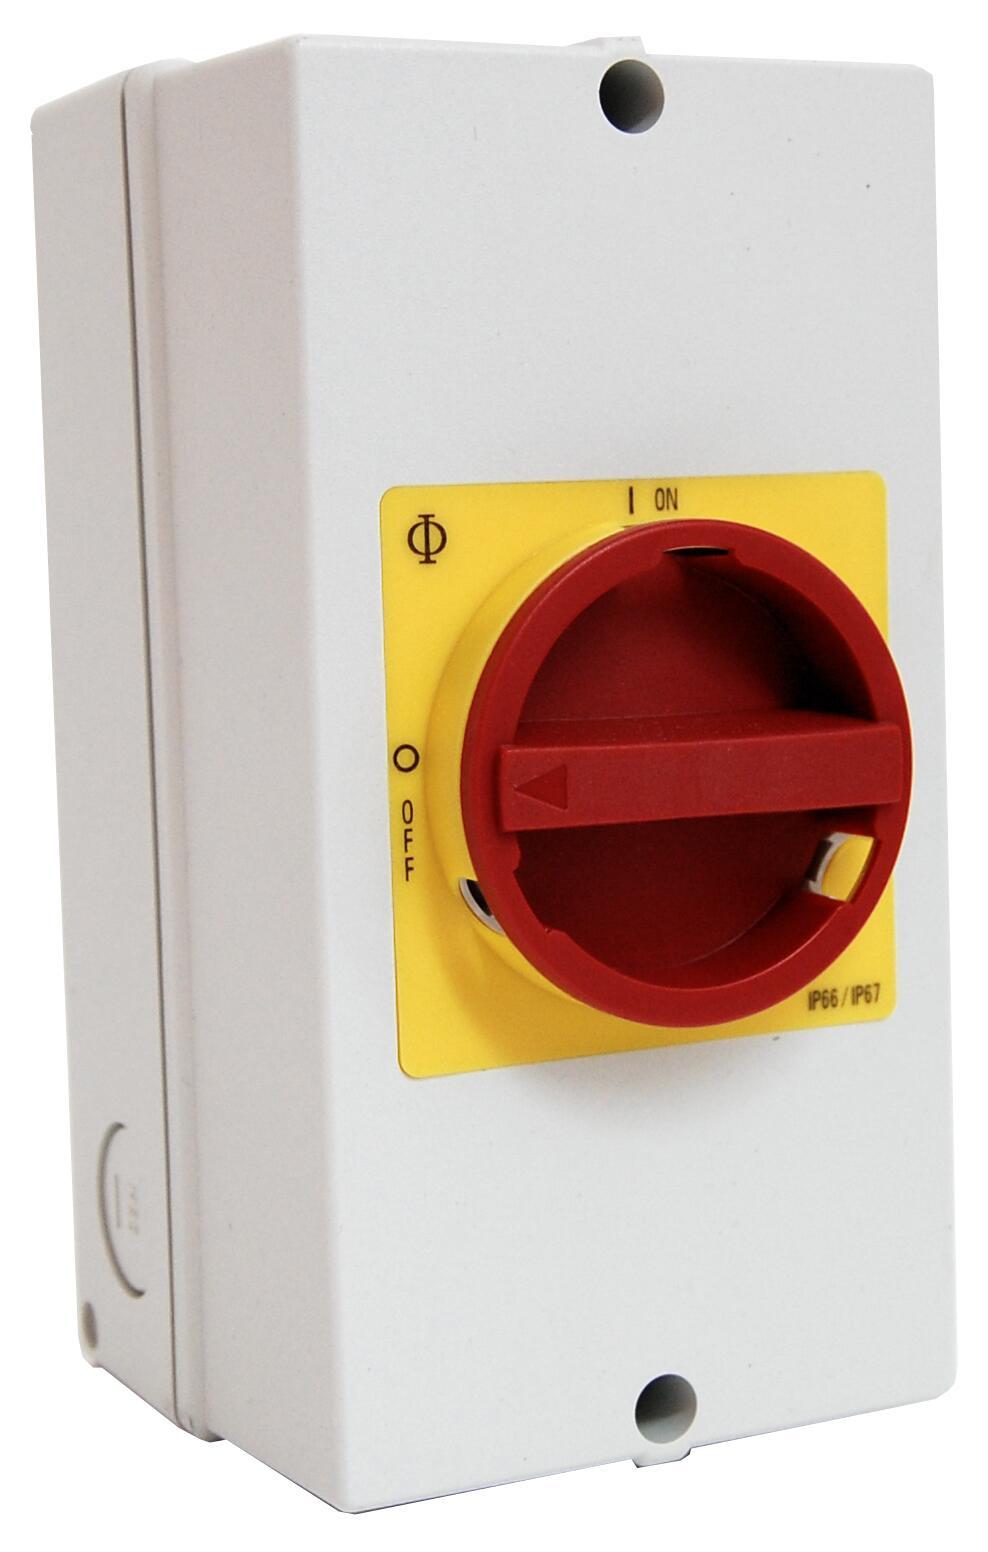 1 Stk Not-Aus-Schalter, 6-polig + 2 Hilfskontakte, PE-Klemme, 25A IN892011--